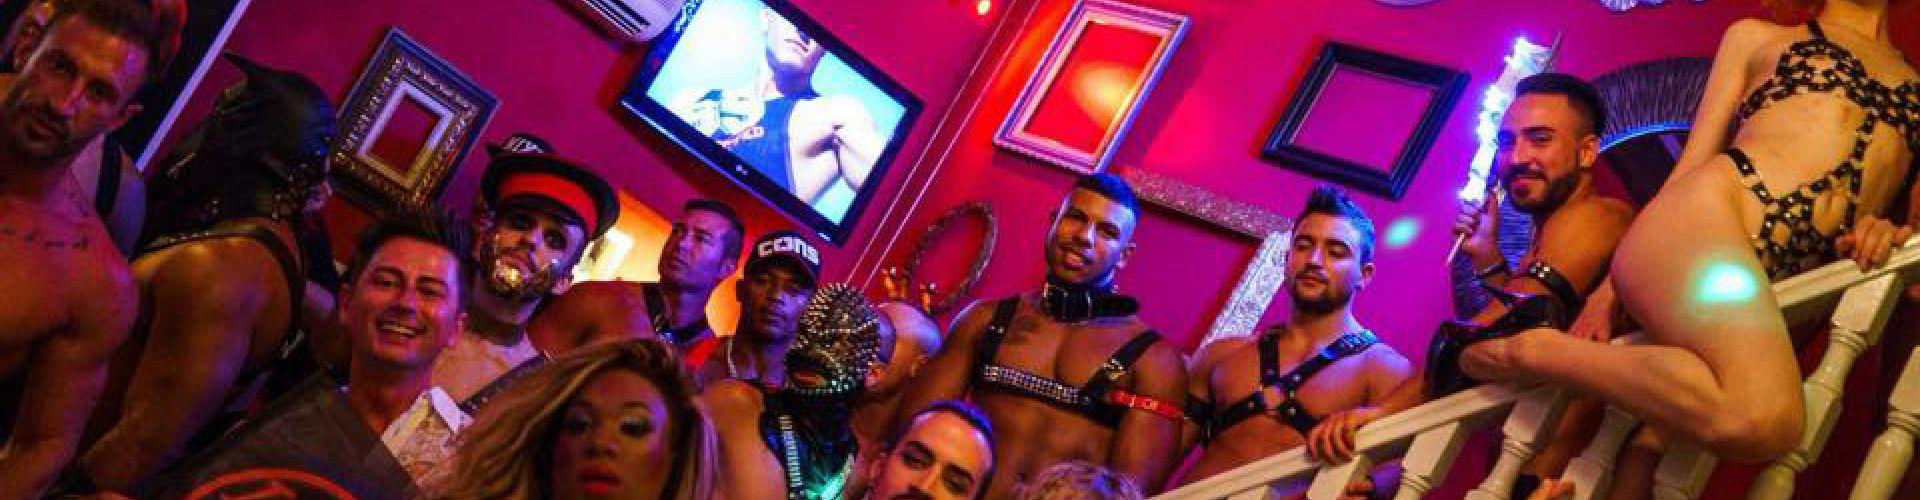 Ibiza gay bar la muralla